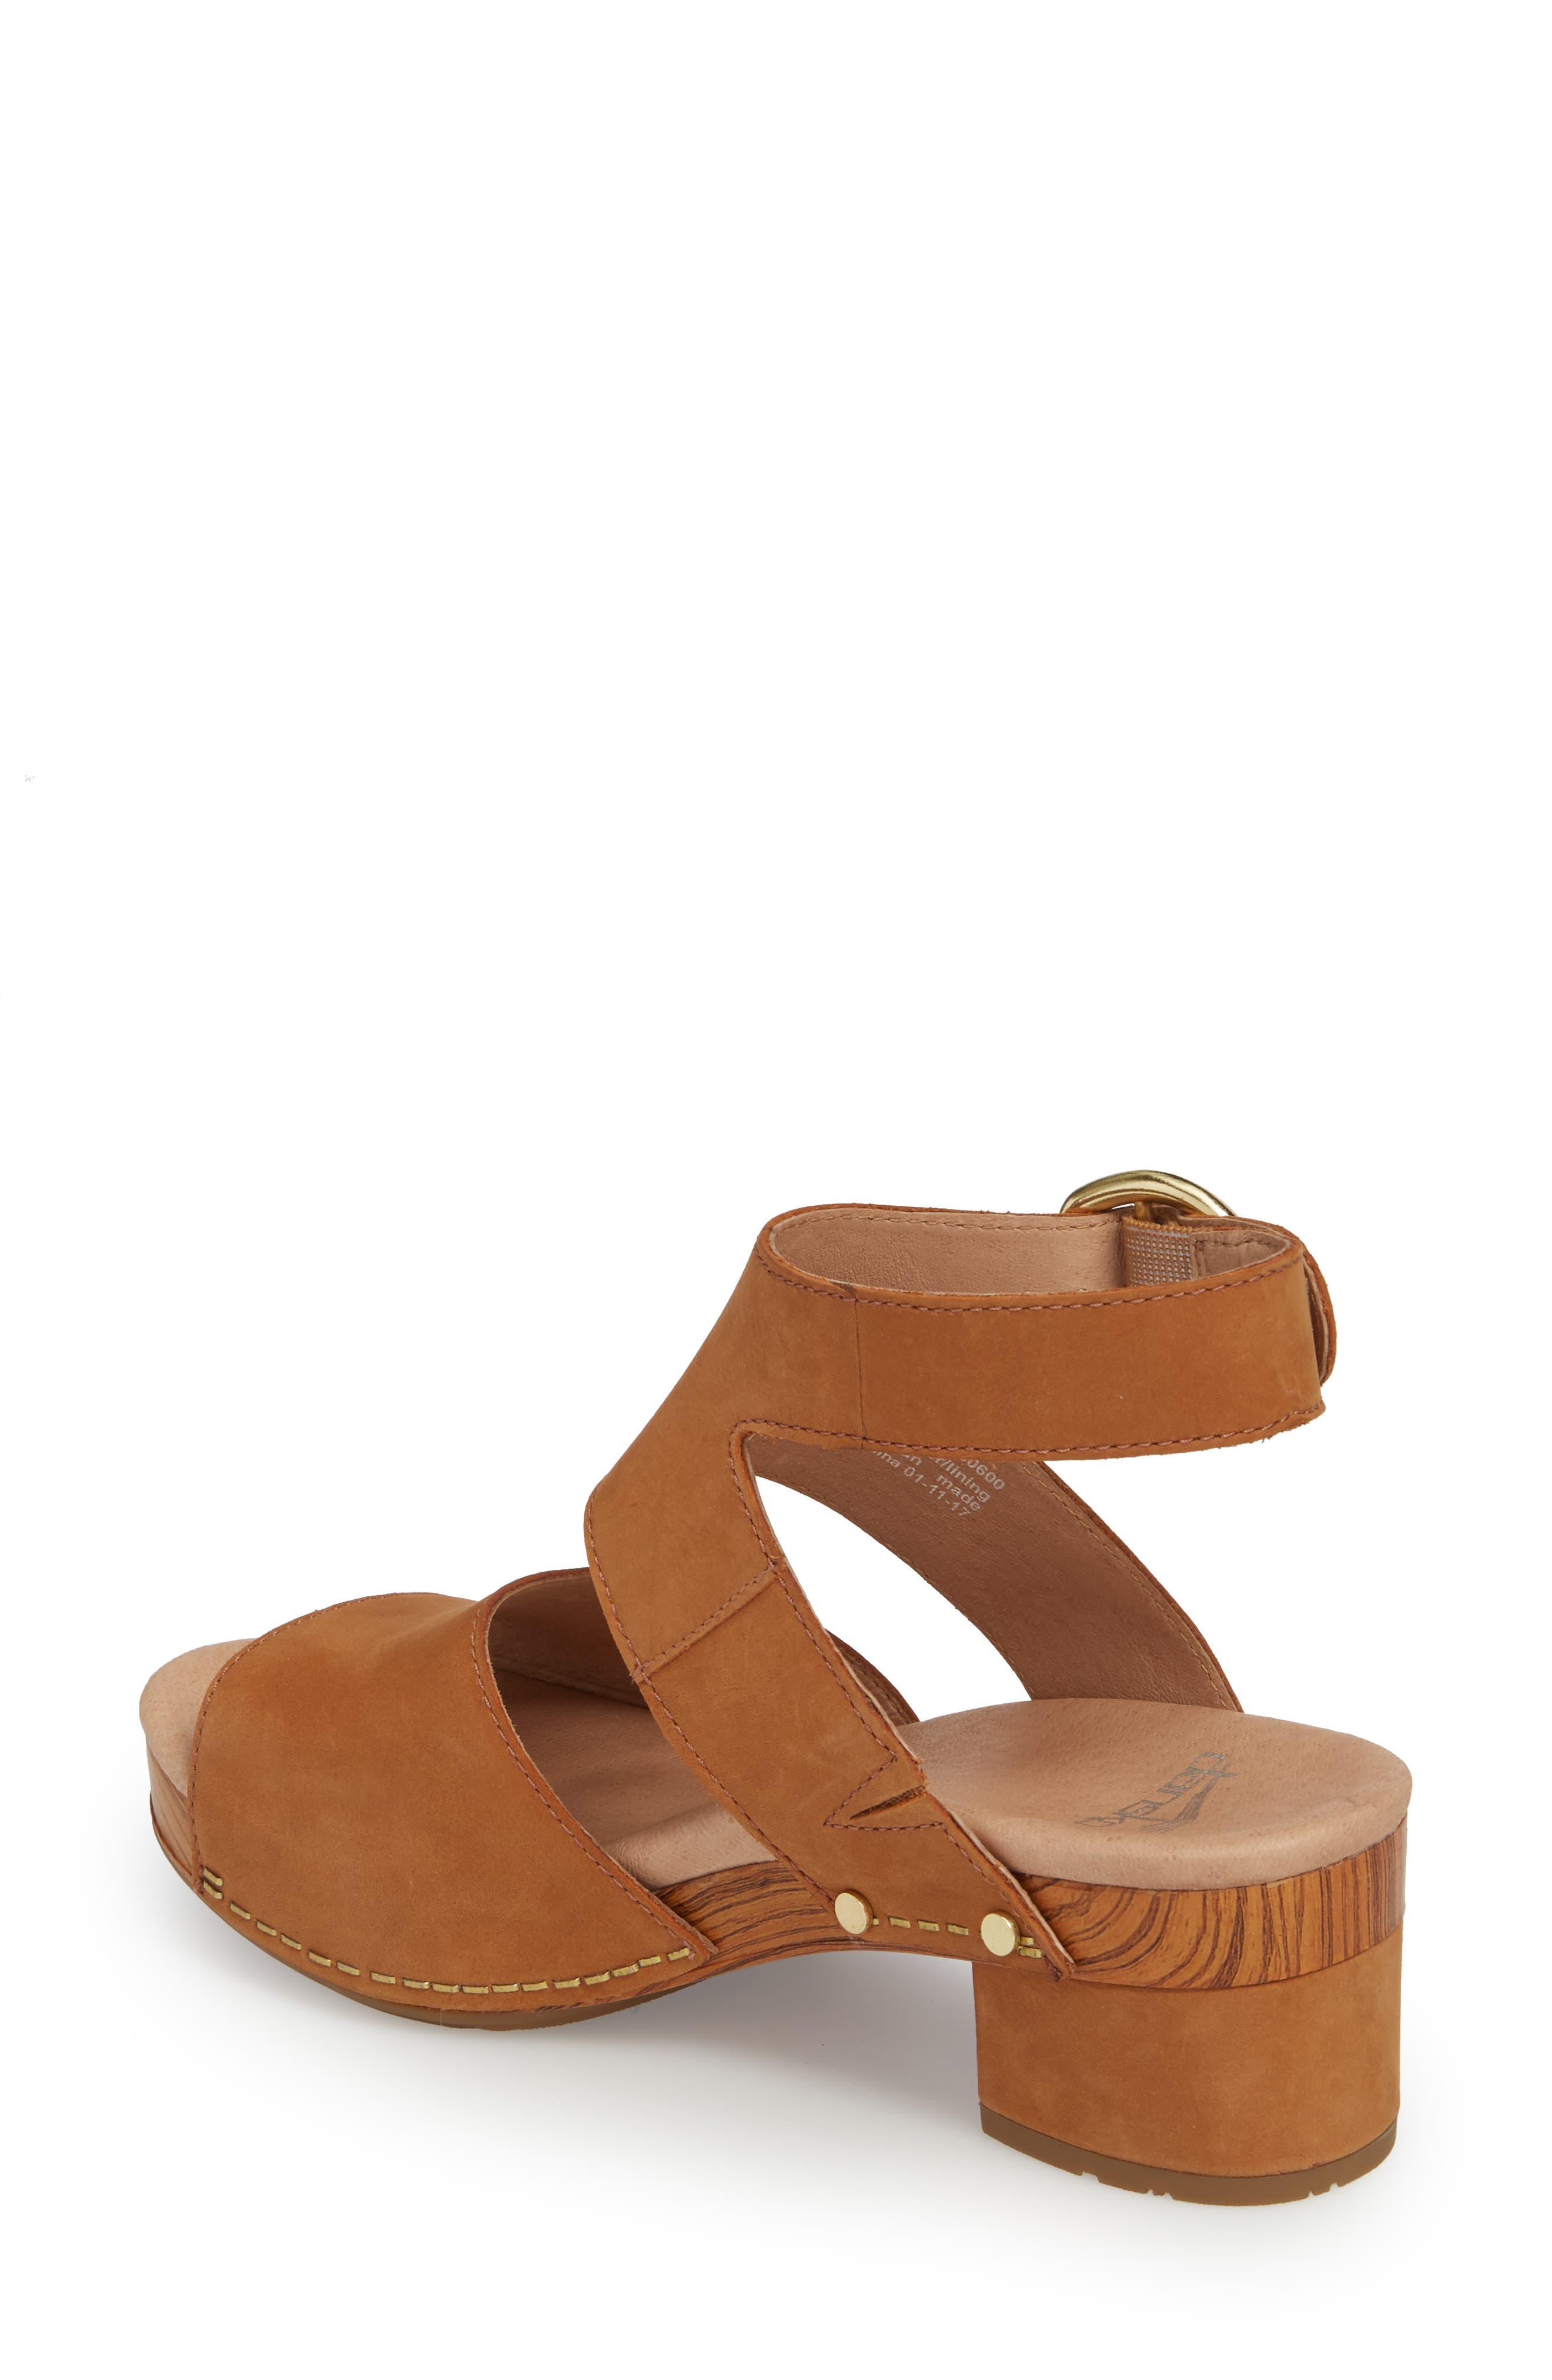 Minka Sandal,                             Alternate thumbnail 2, color,                             Camel Milled Nubuck Leather